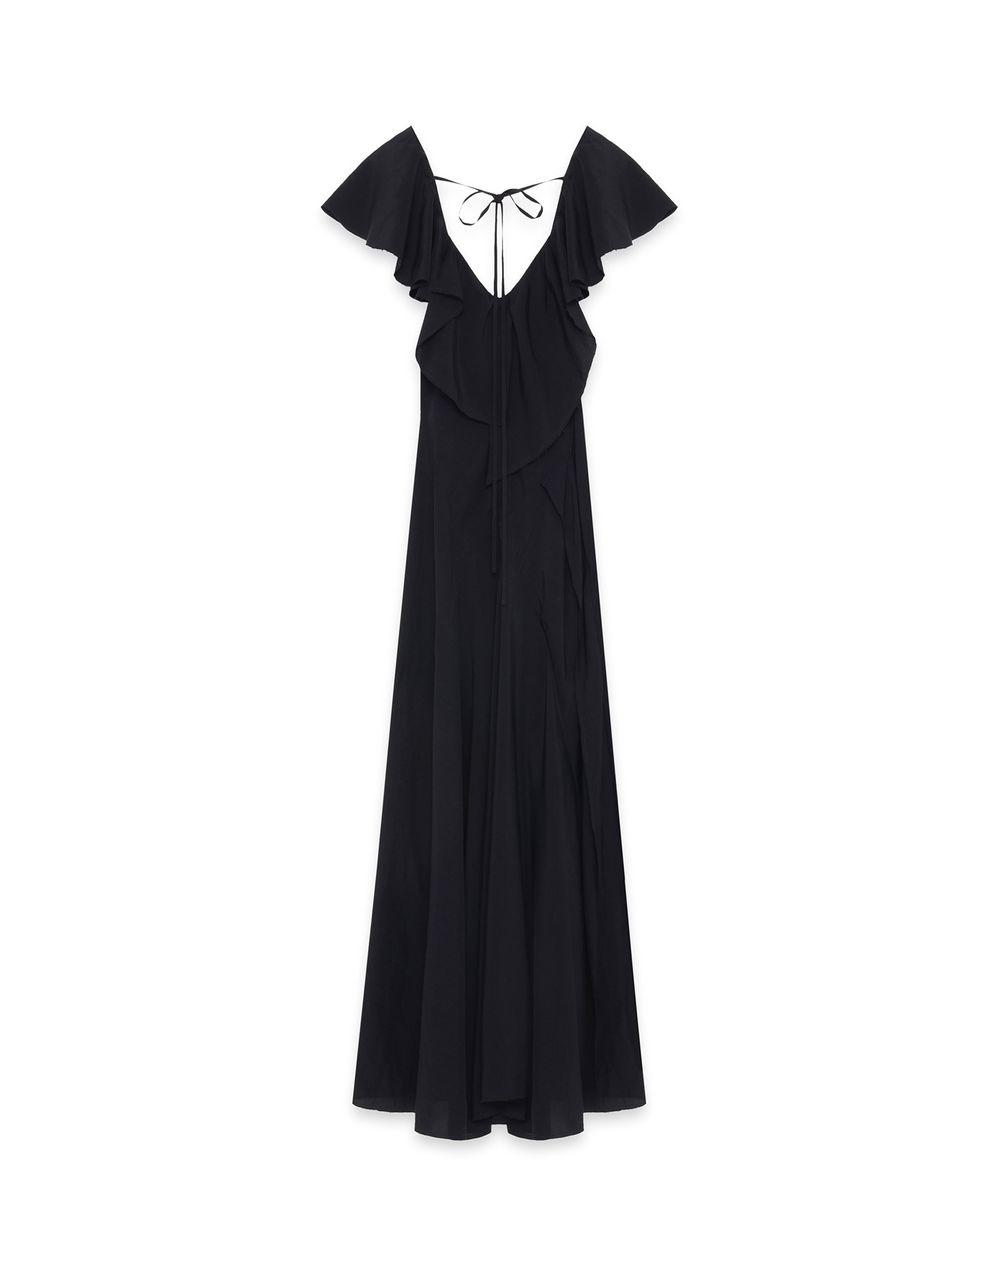 LONG RUFFLE DRESS - Lanvin